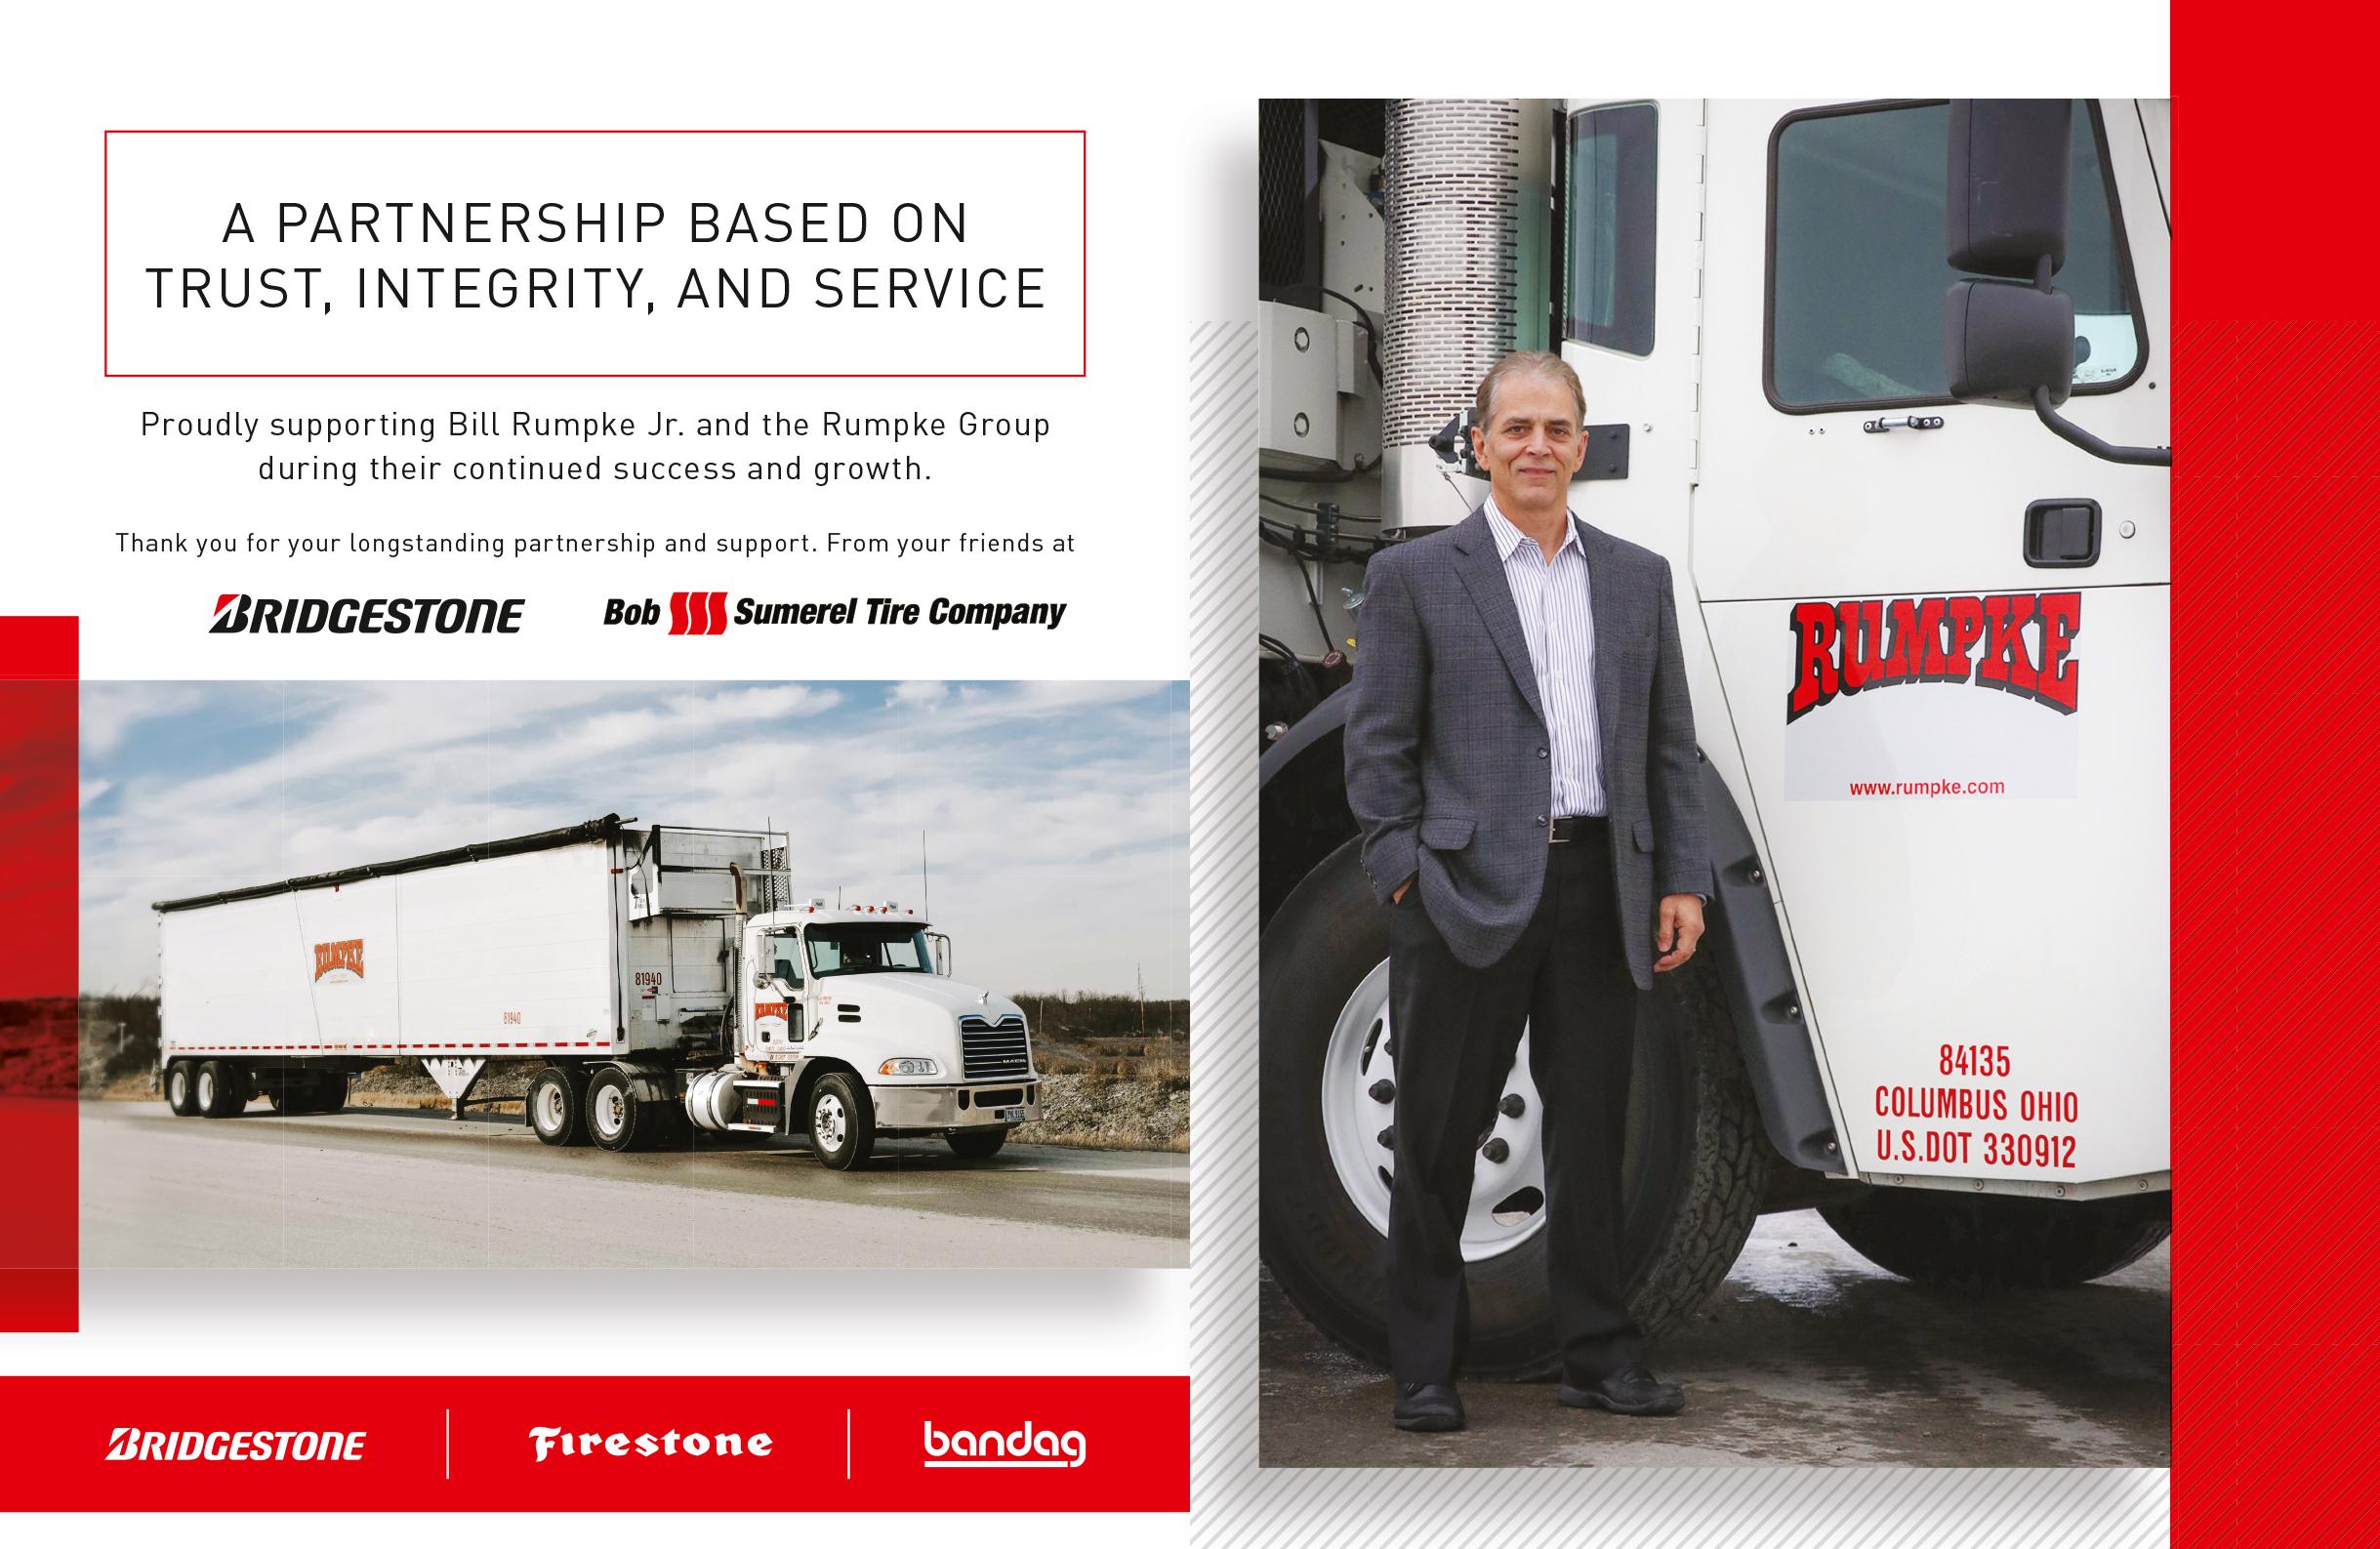 Bob-Sumerel-Tire-Company